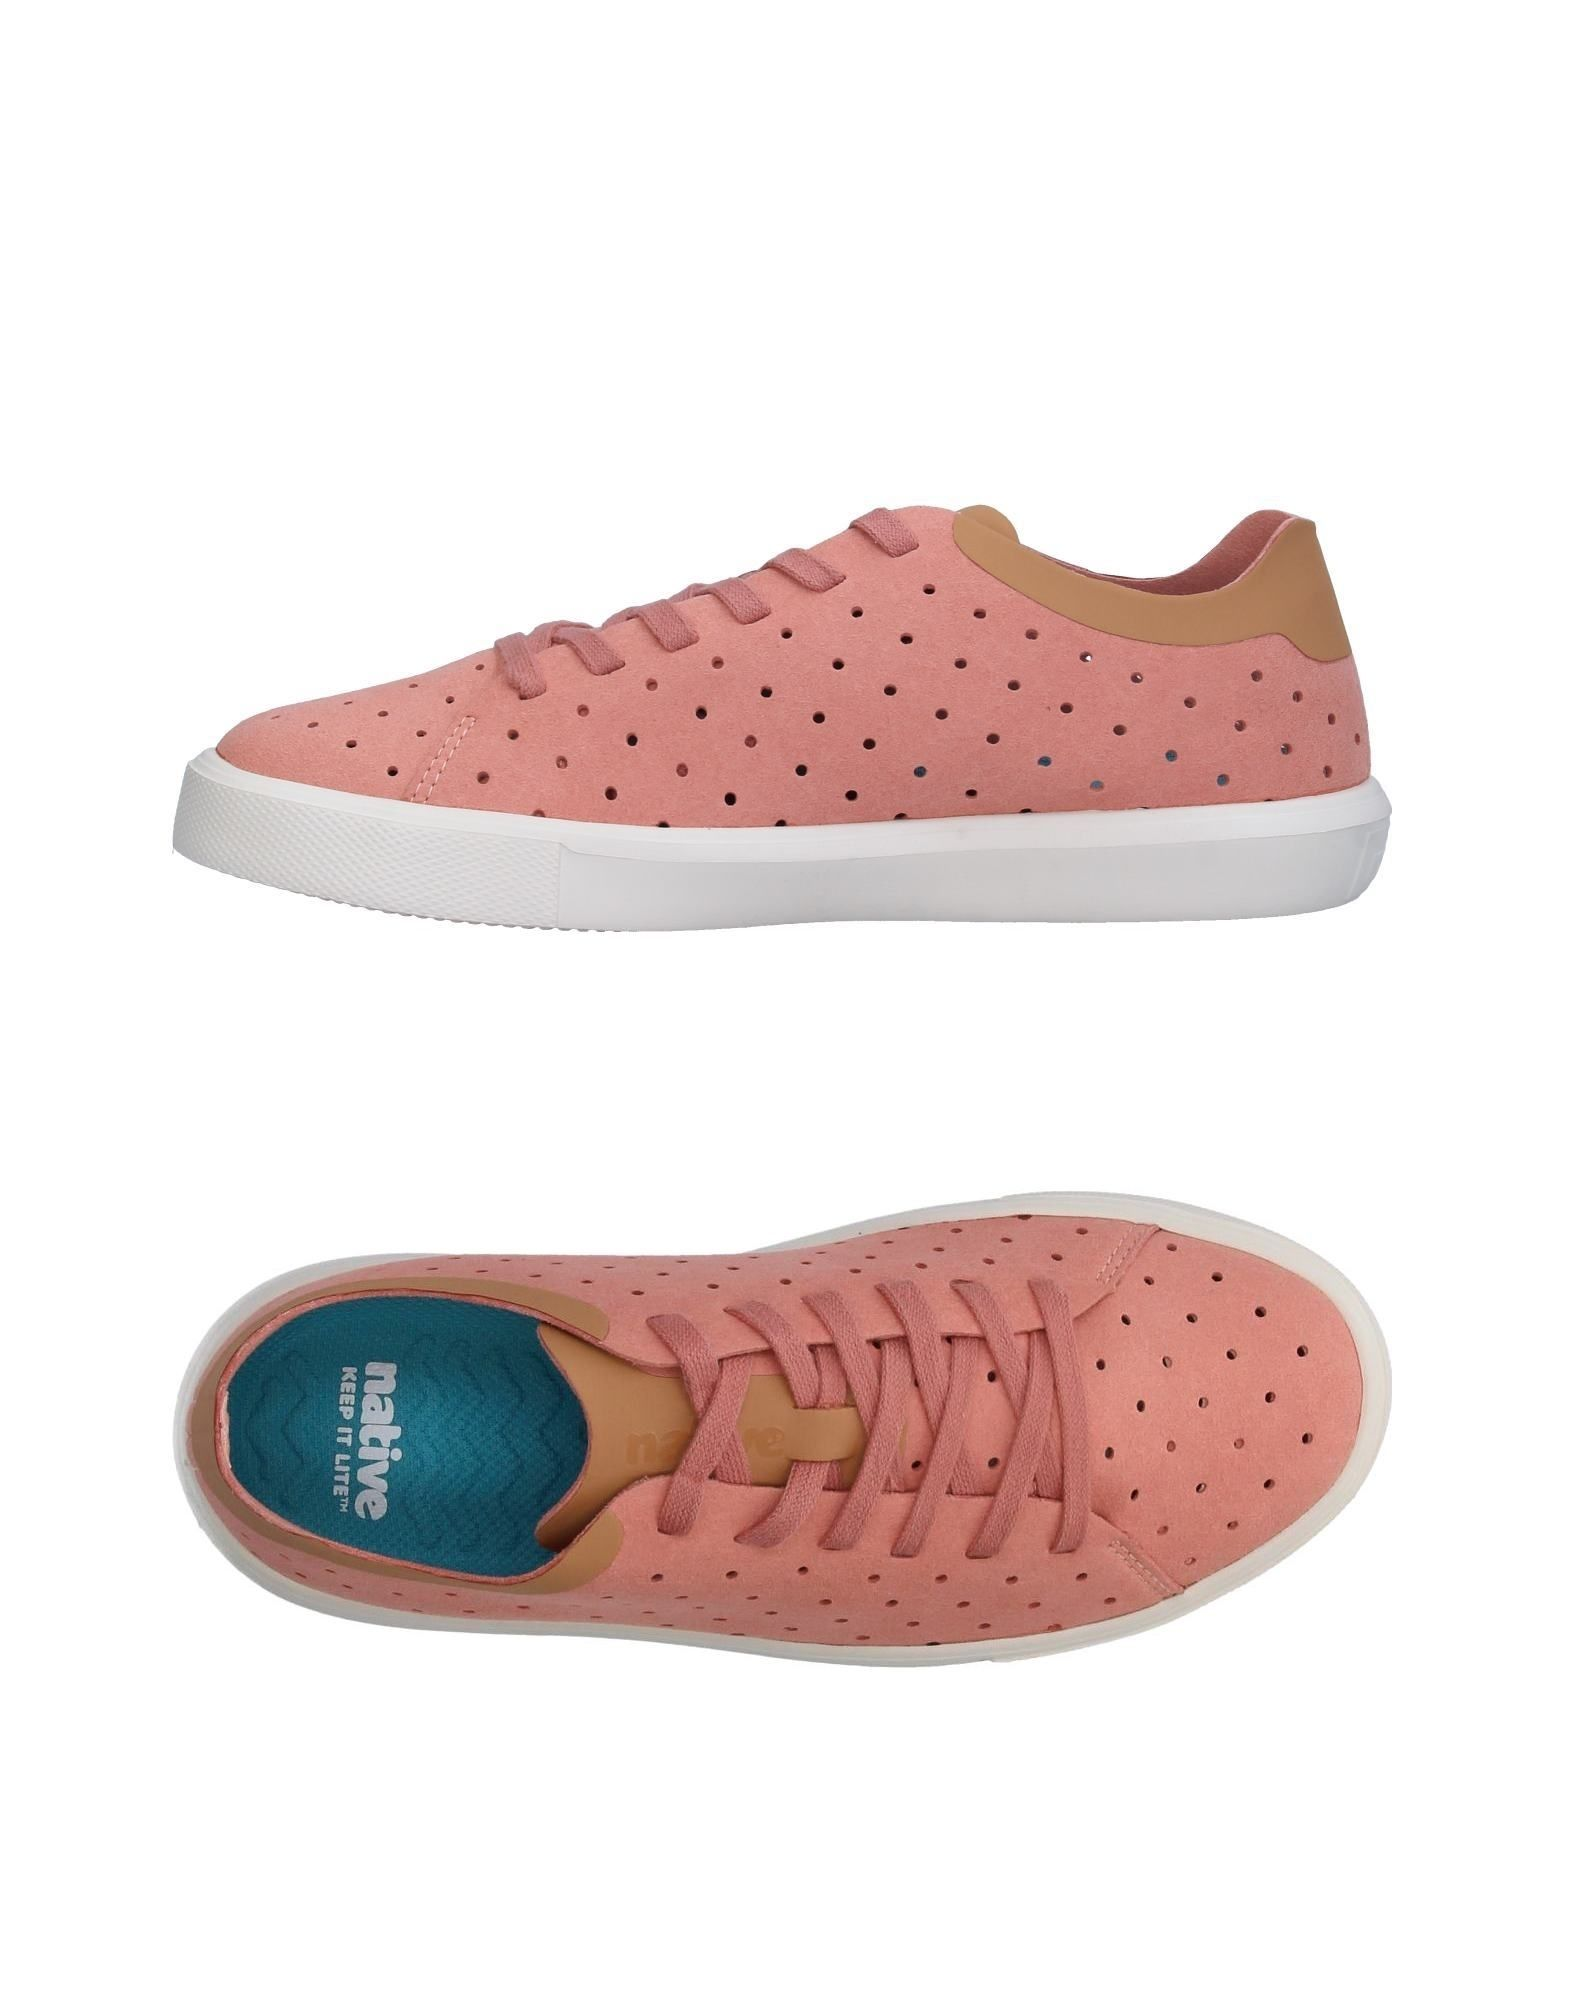 Moda Sneakers Native Donna Donna Native - 11337493VH 889945